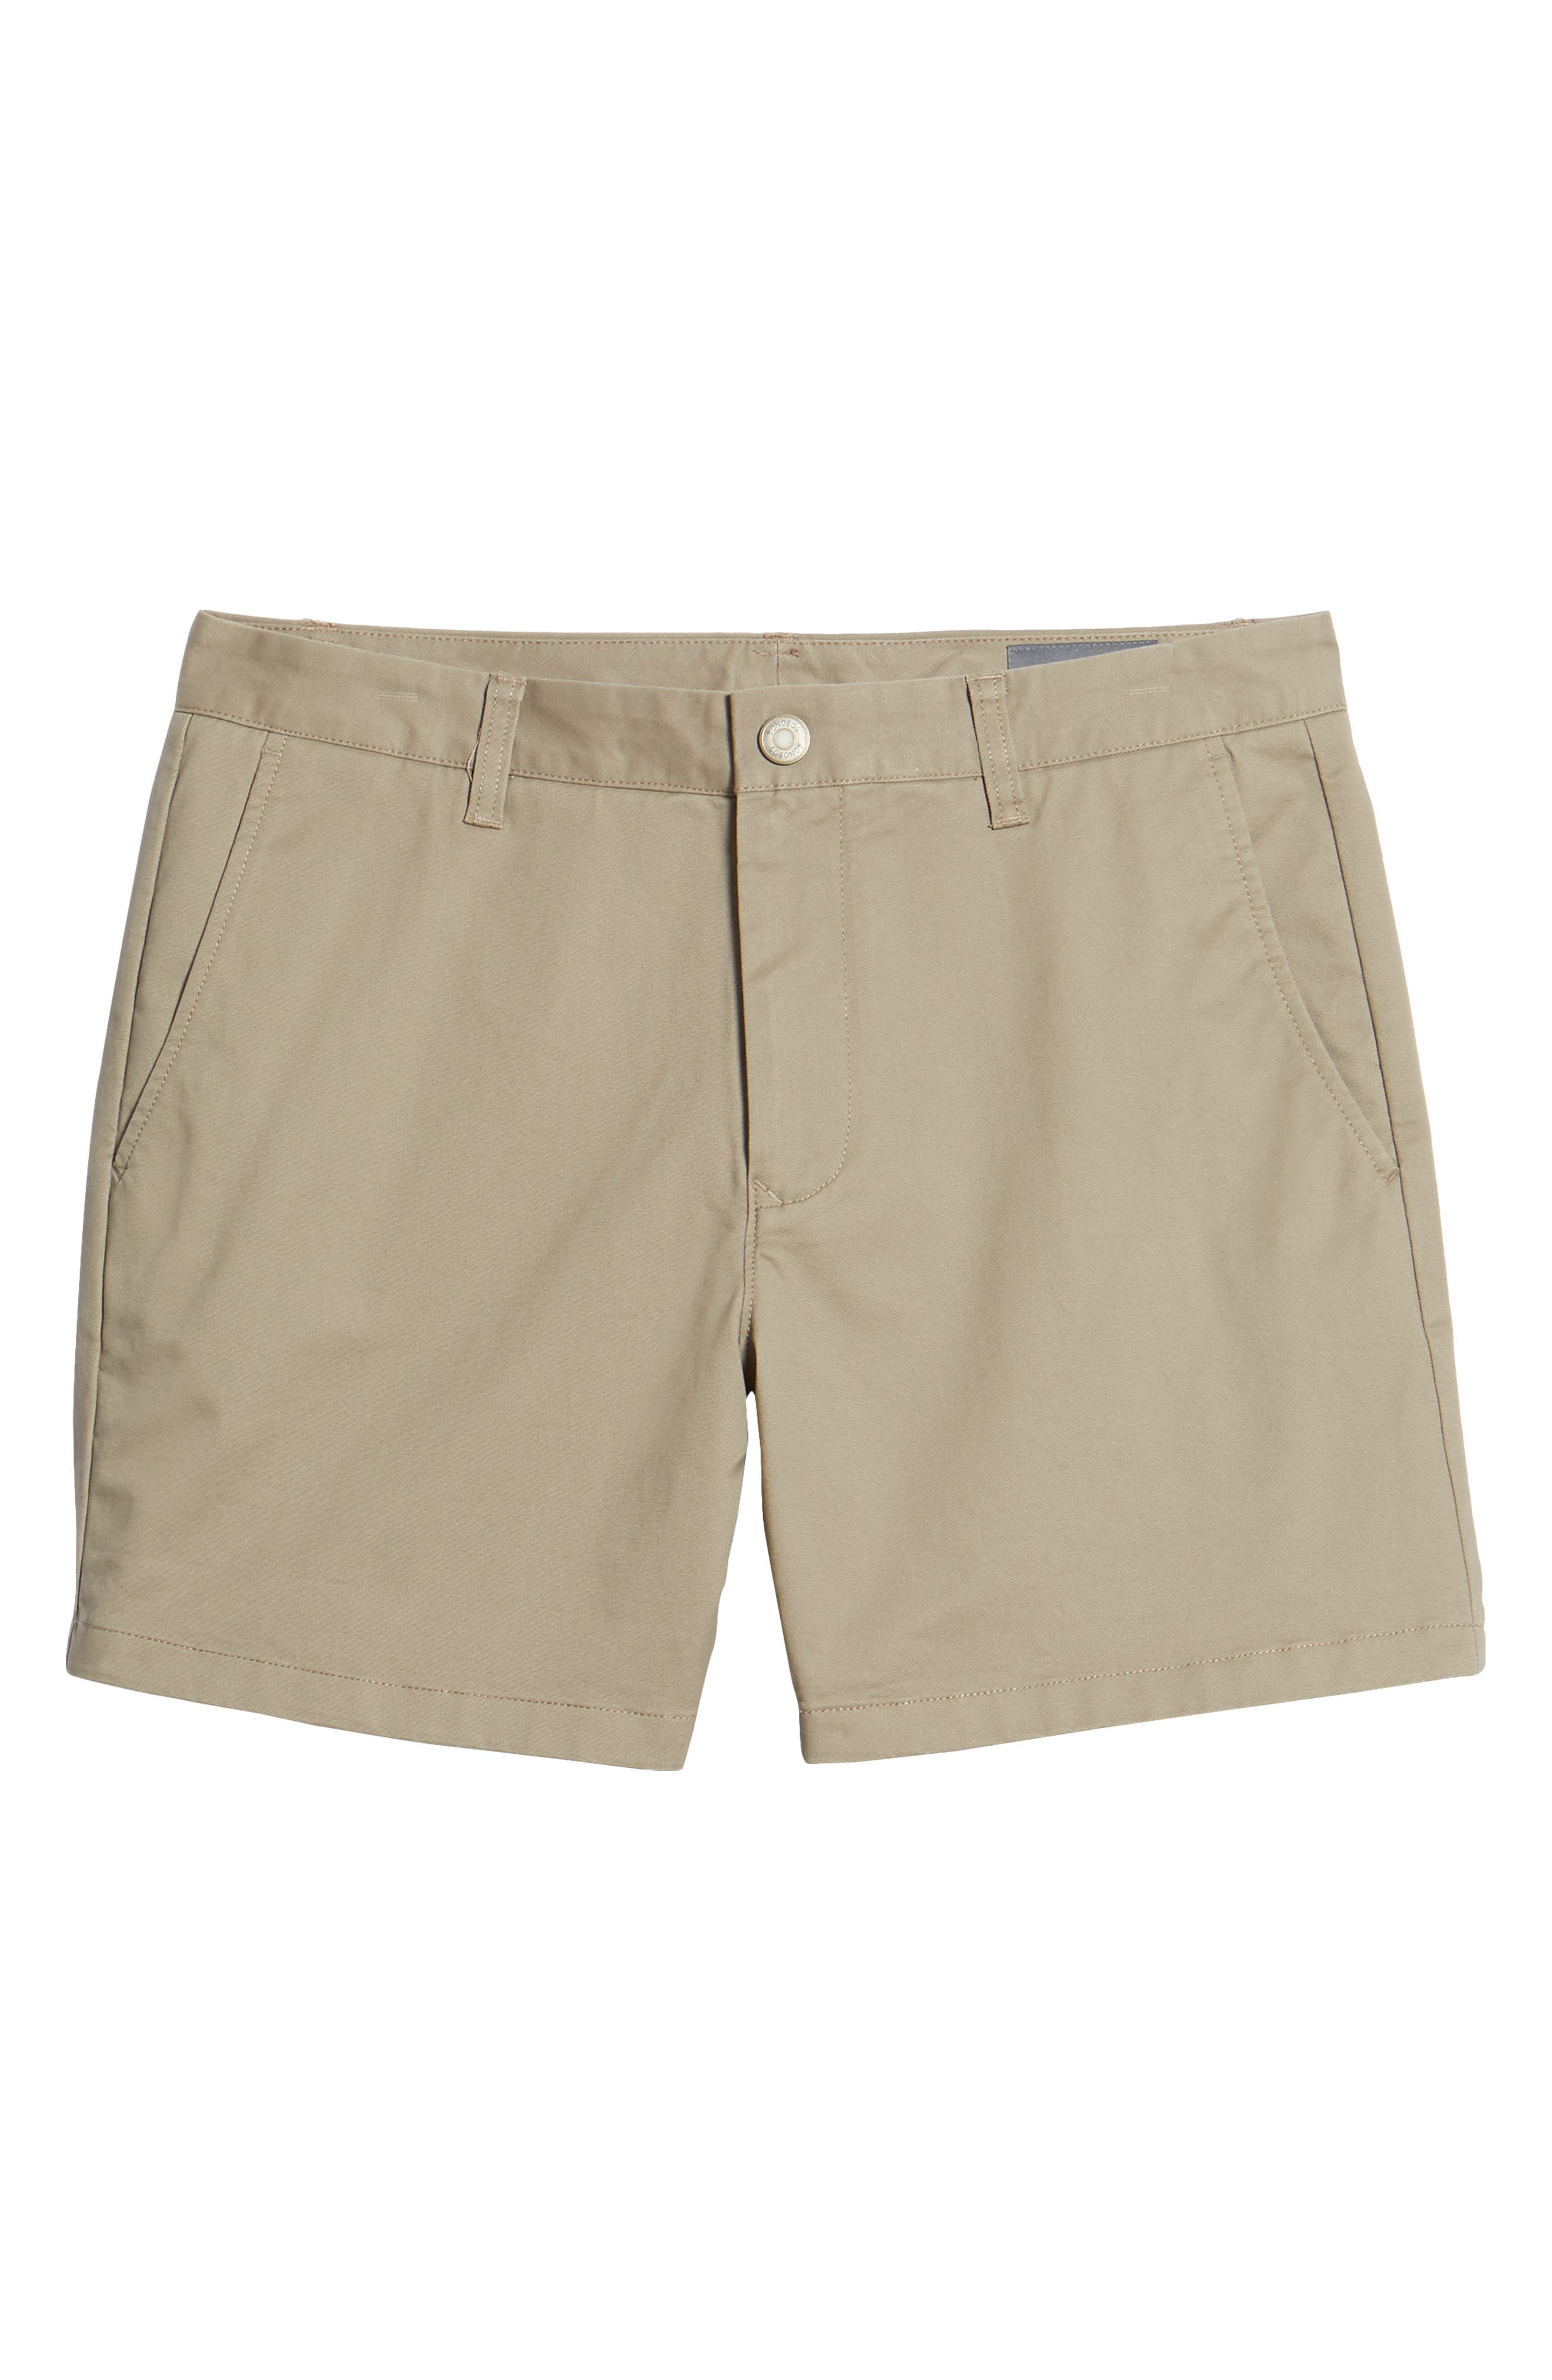 Bonobos Stretch Washed Chino 5-Inch Shorts